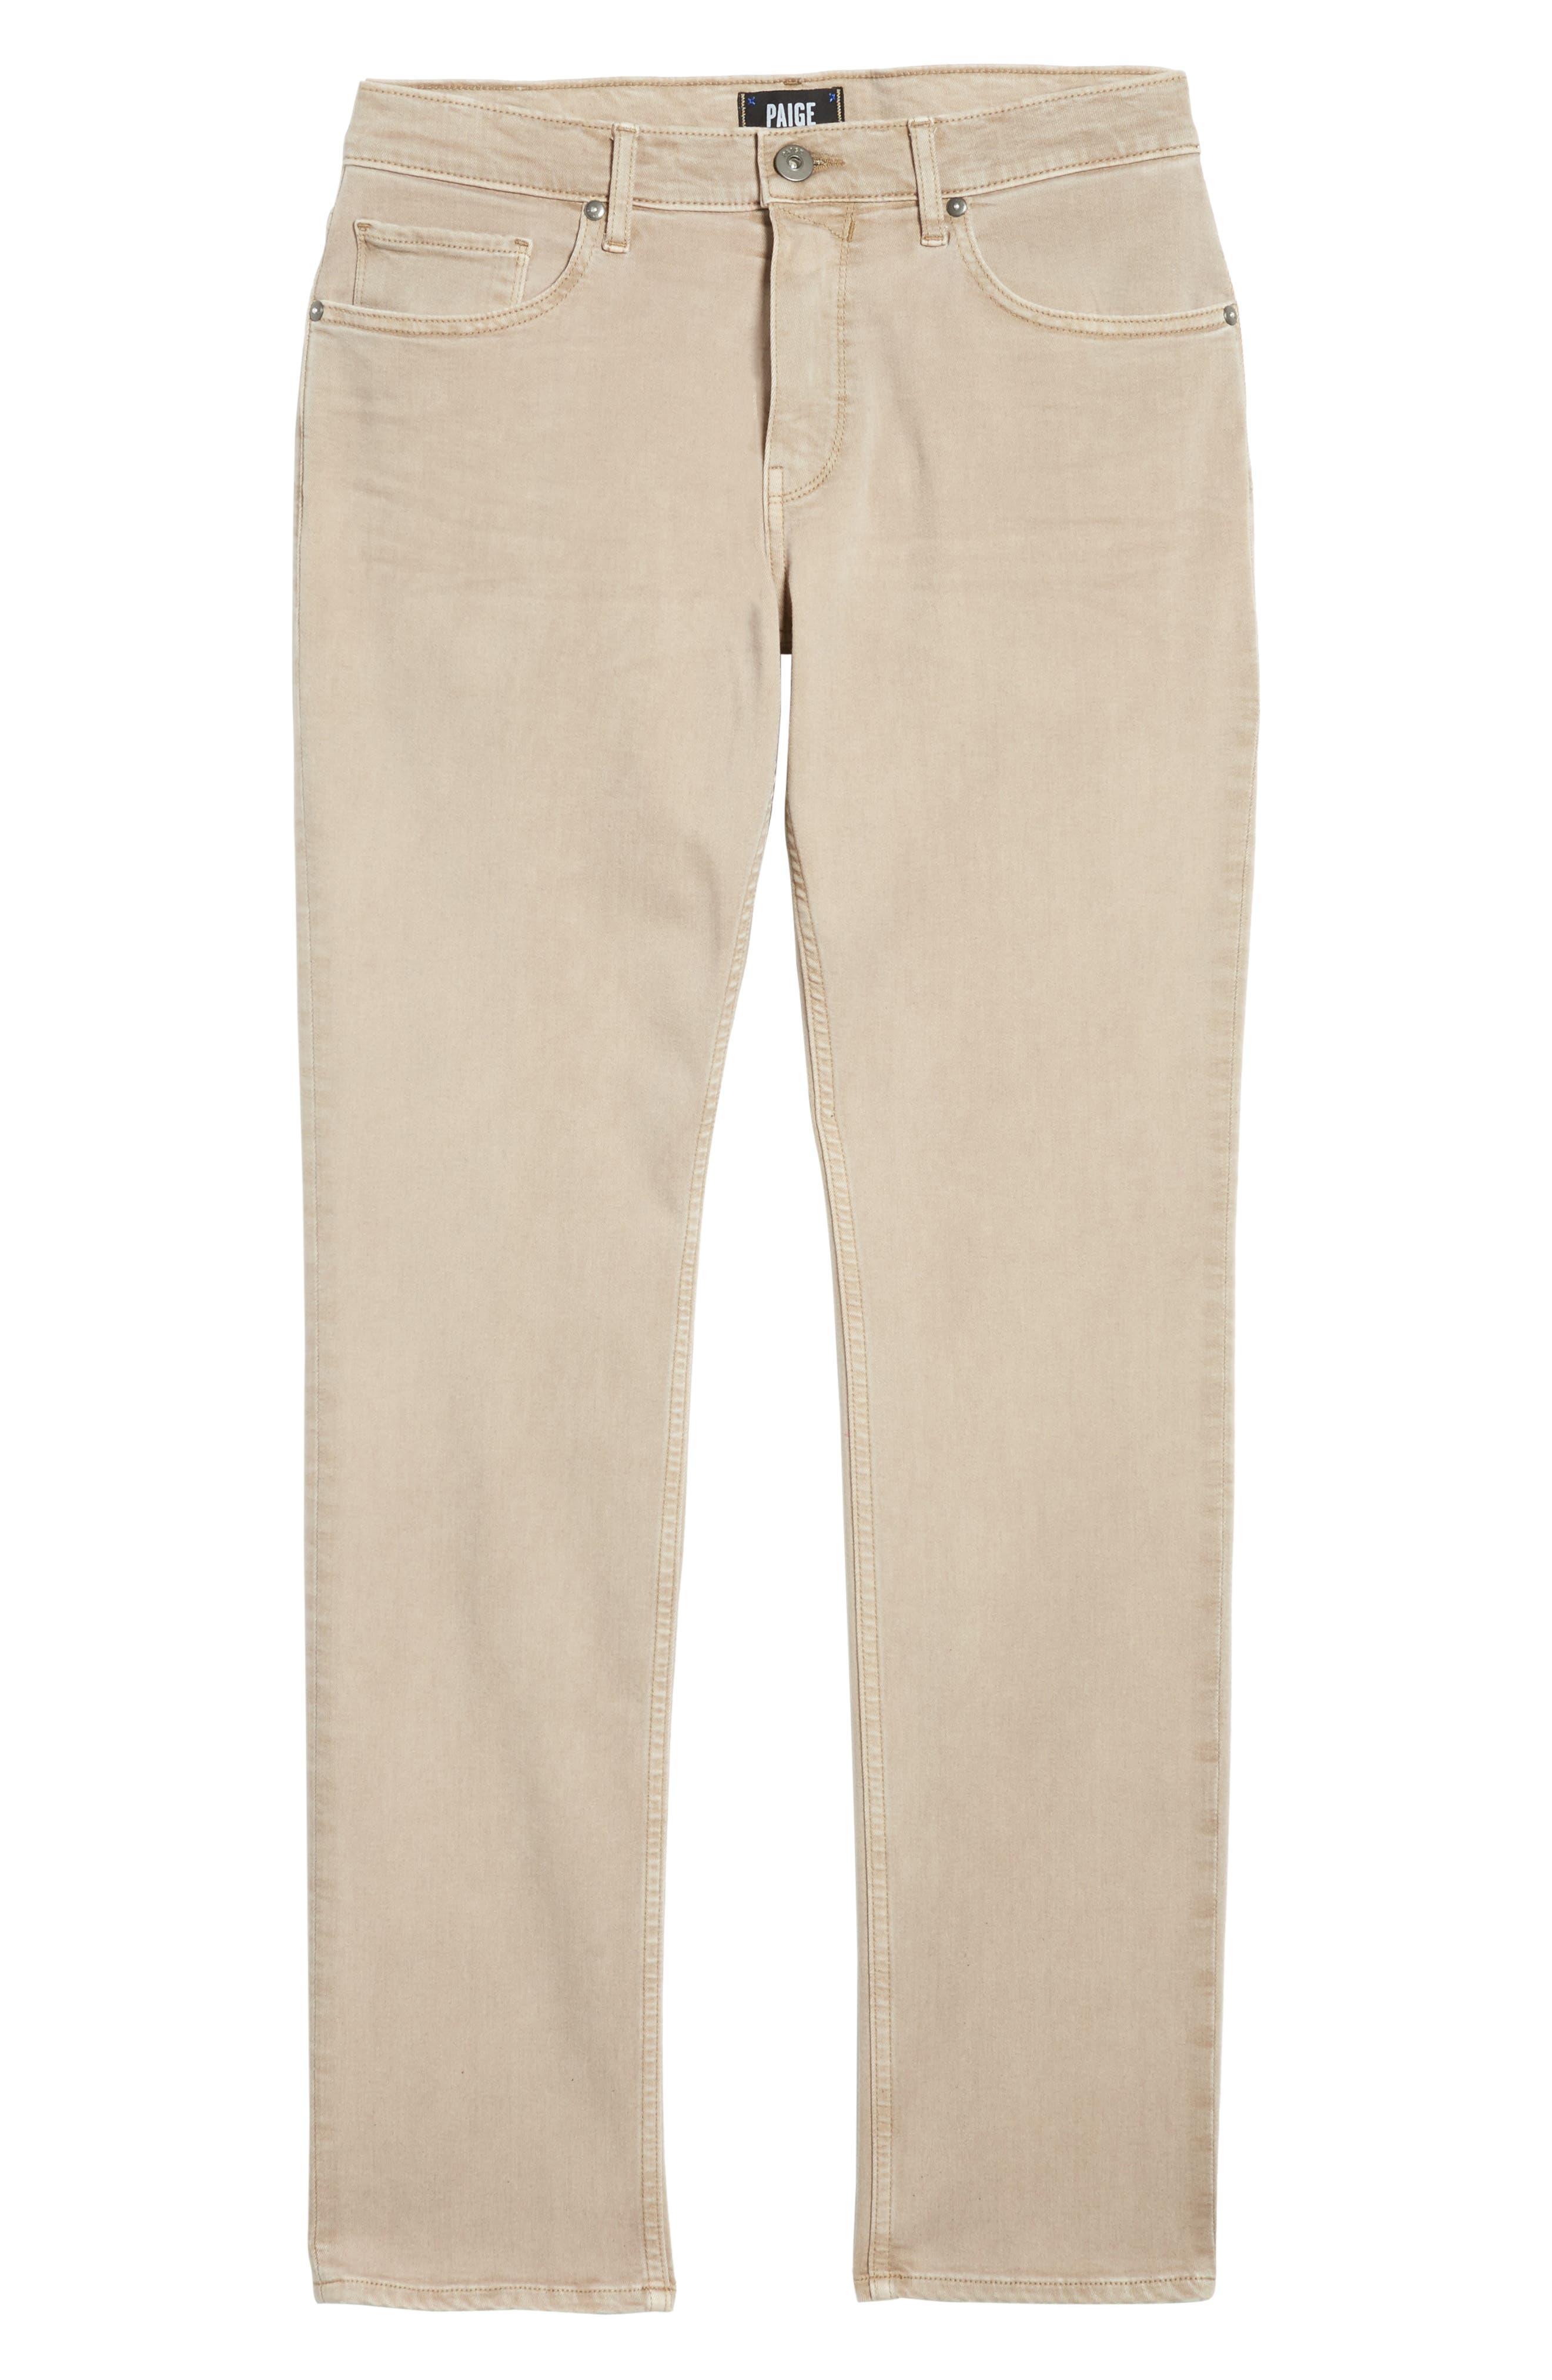 PAIGE,                             Federal Slim Straight Leg Jeans,                             Alternate thumbnail 6, color,                             250